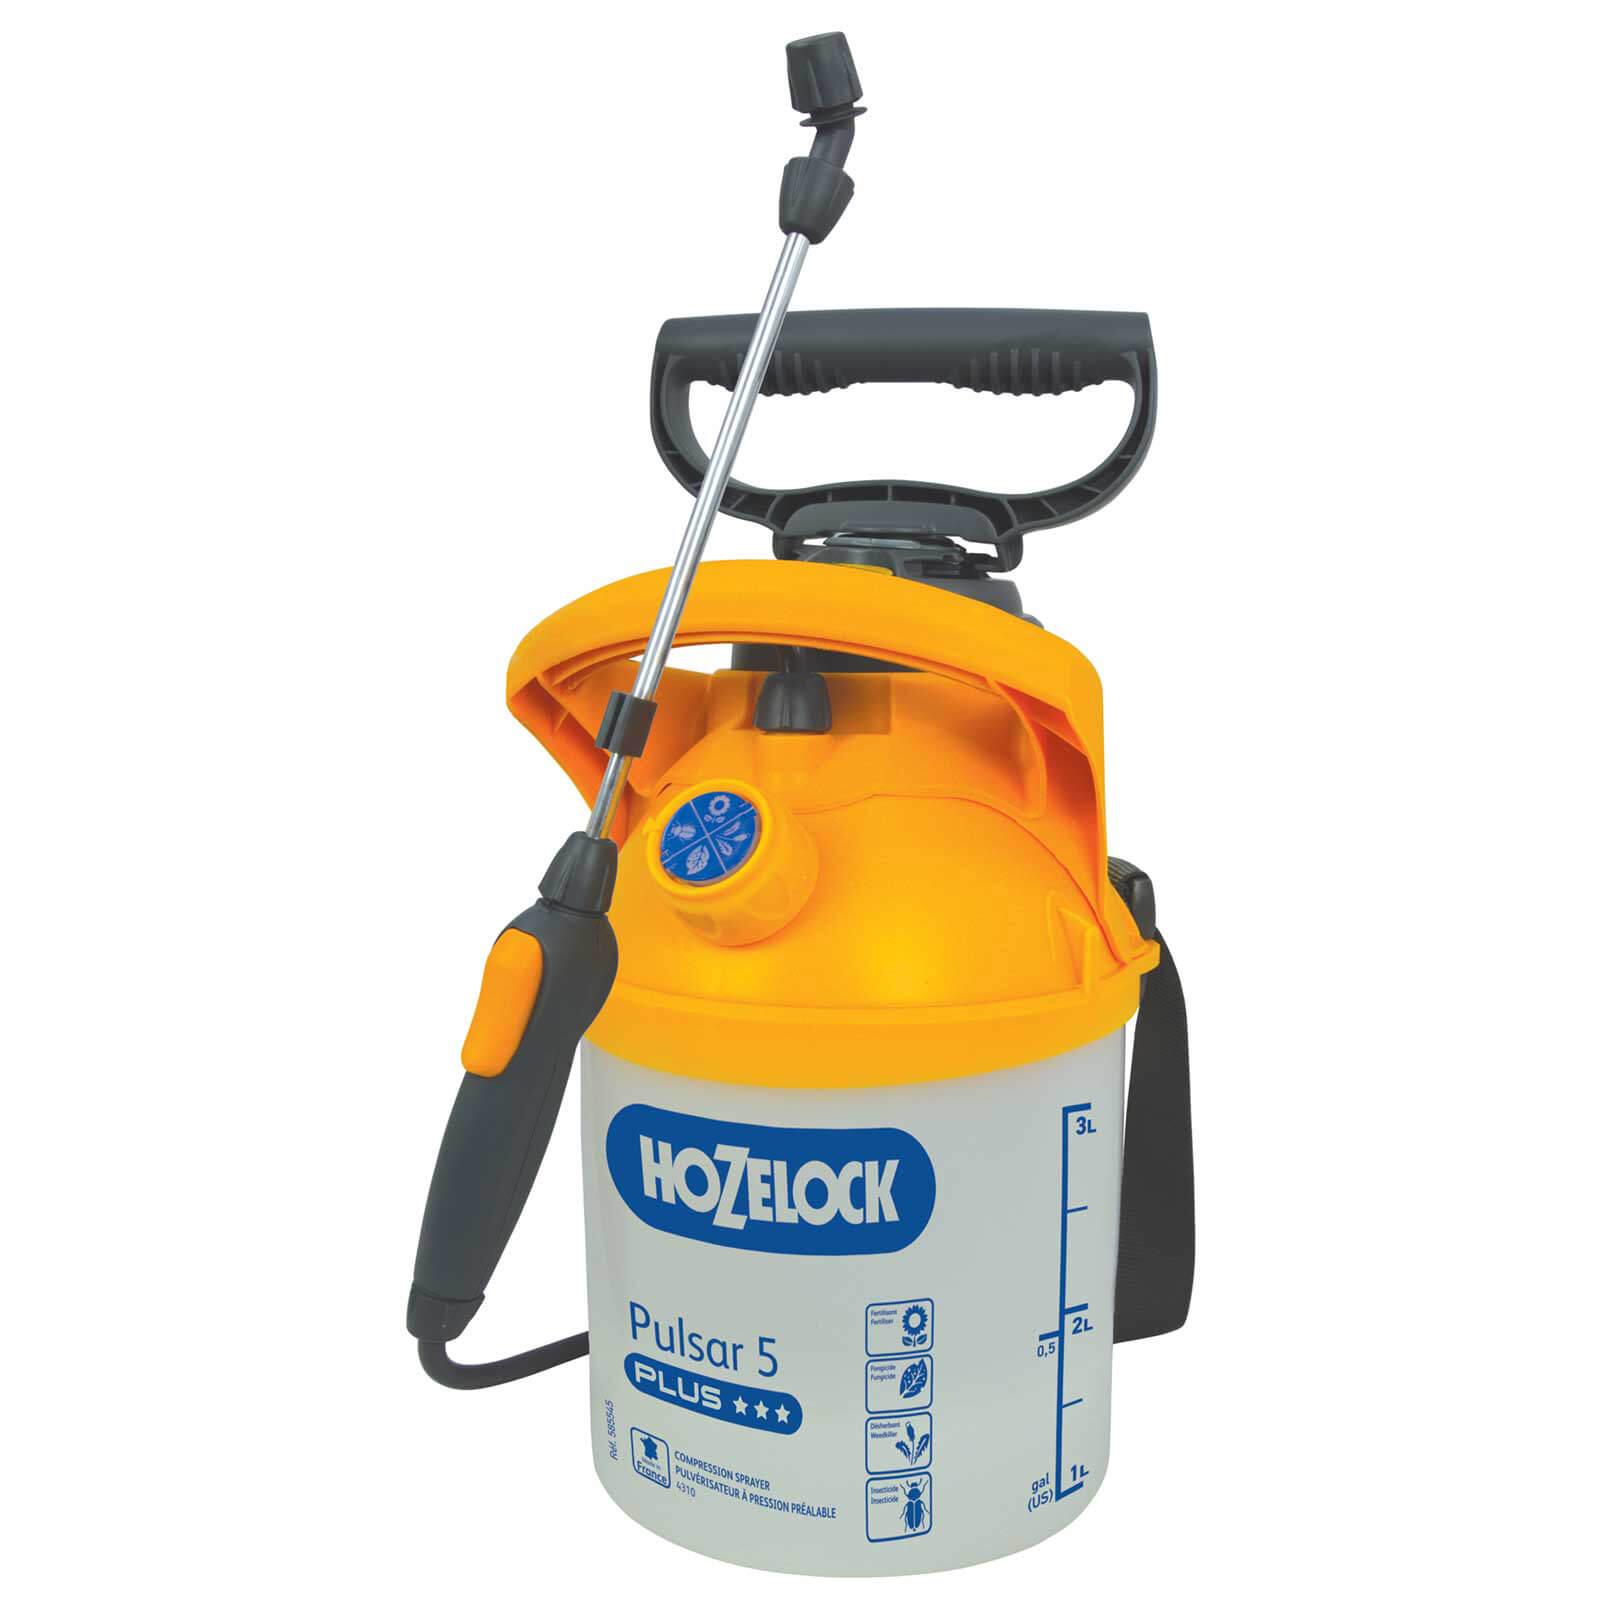 Hozelock PULSAR PLUS Water Pressure Sprayer 5l